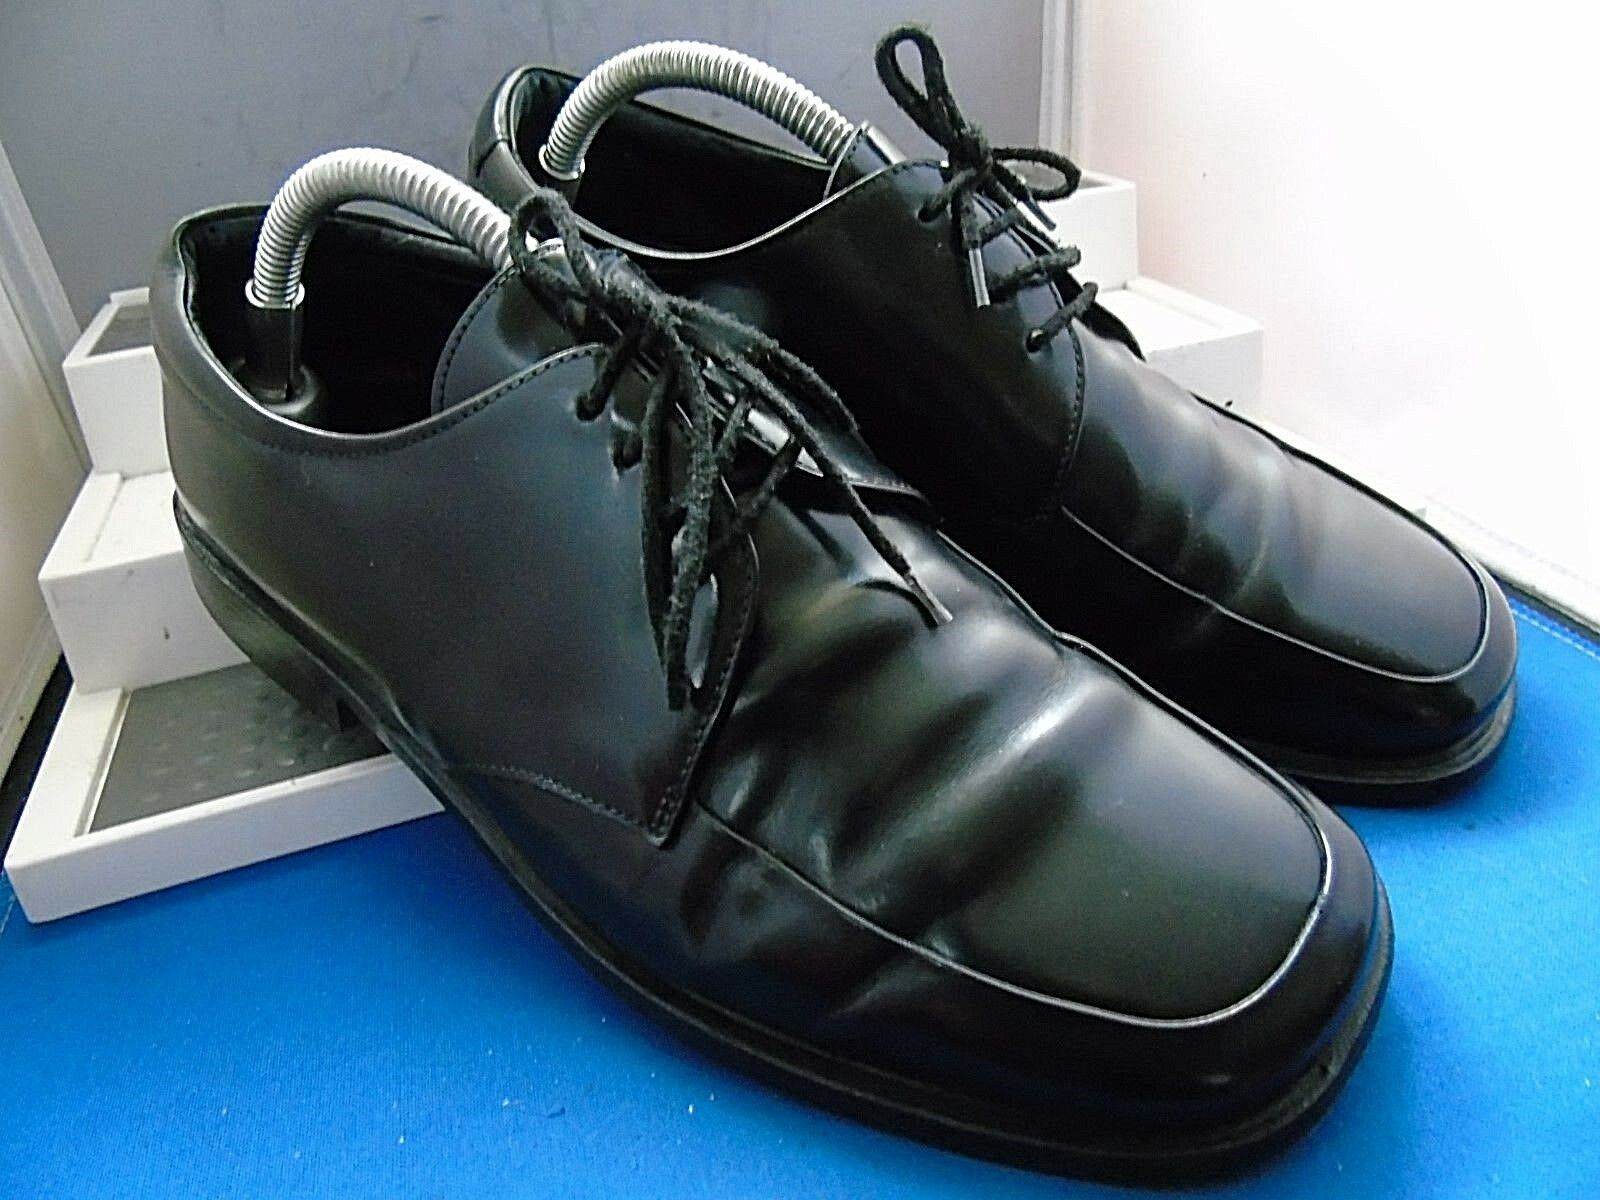 PRADA PRADA PRADA DESIGNER BLACK LEATHER TWIN DERBY WORK Schuhe UK 6.5 EU 40.5 US 7.5 7cf455